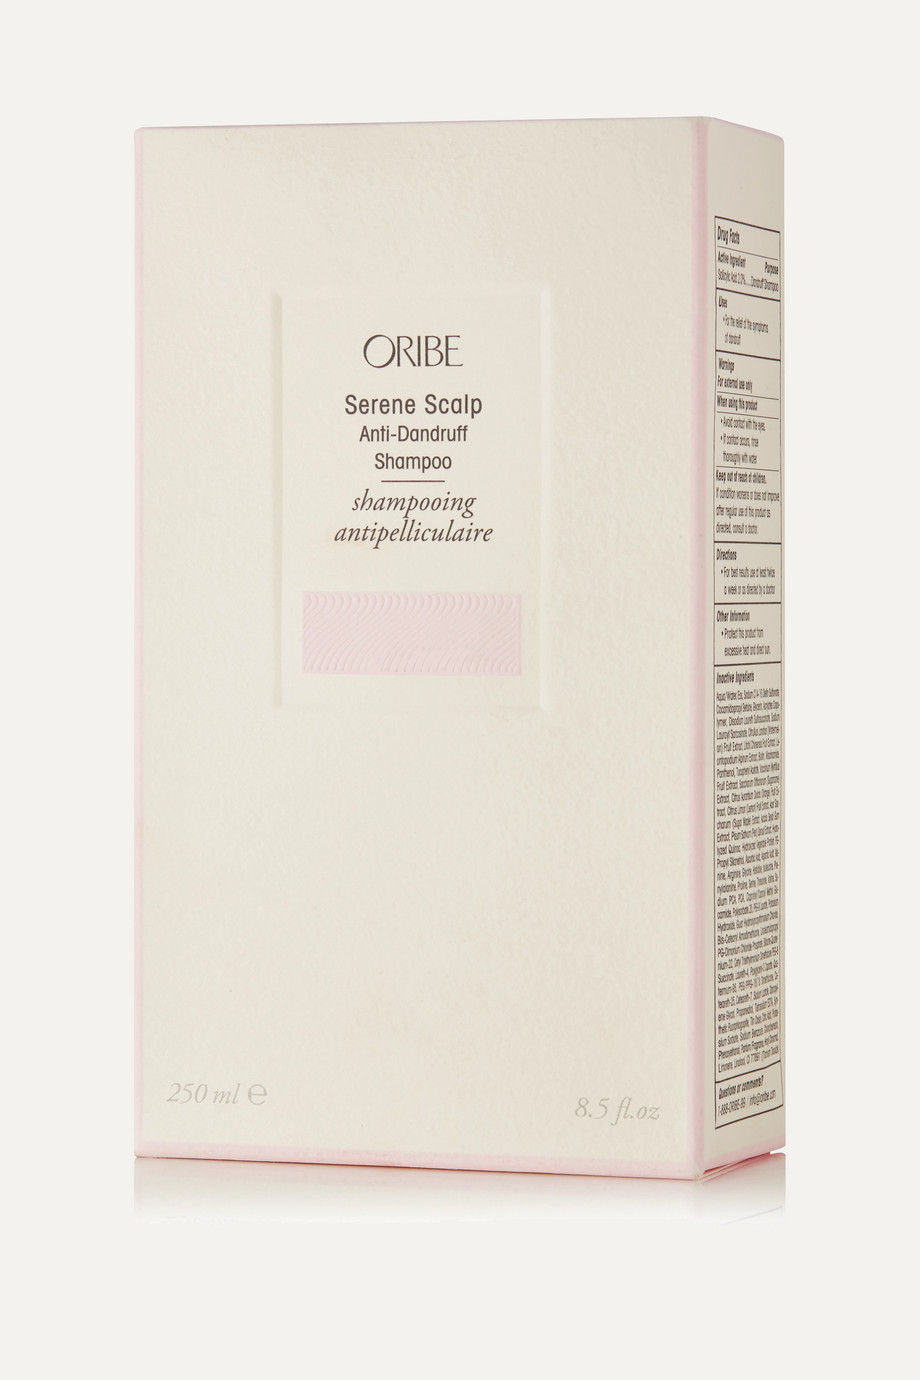 Oribe Serene Scalp Anti-Dandruff Shampoo, 250ml